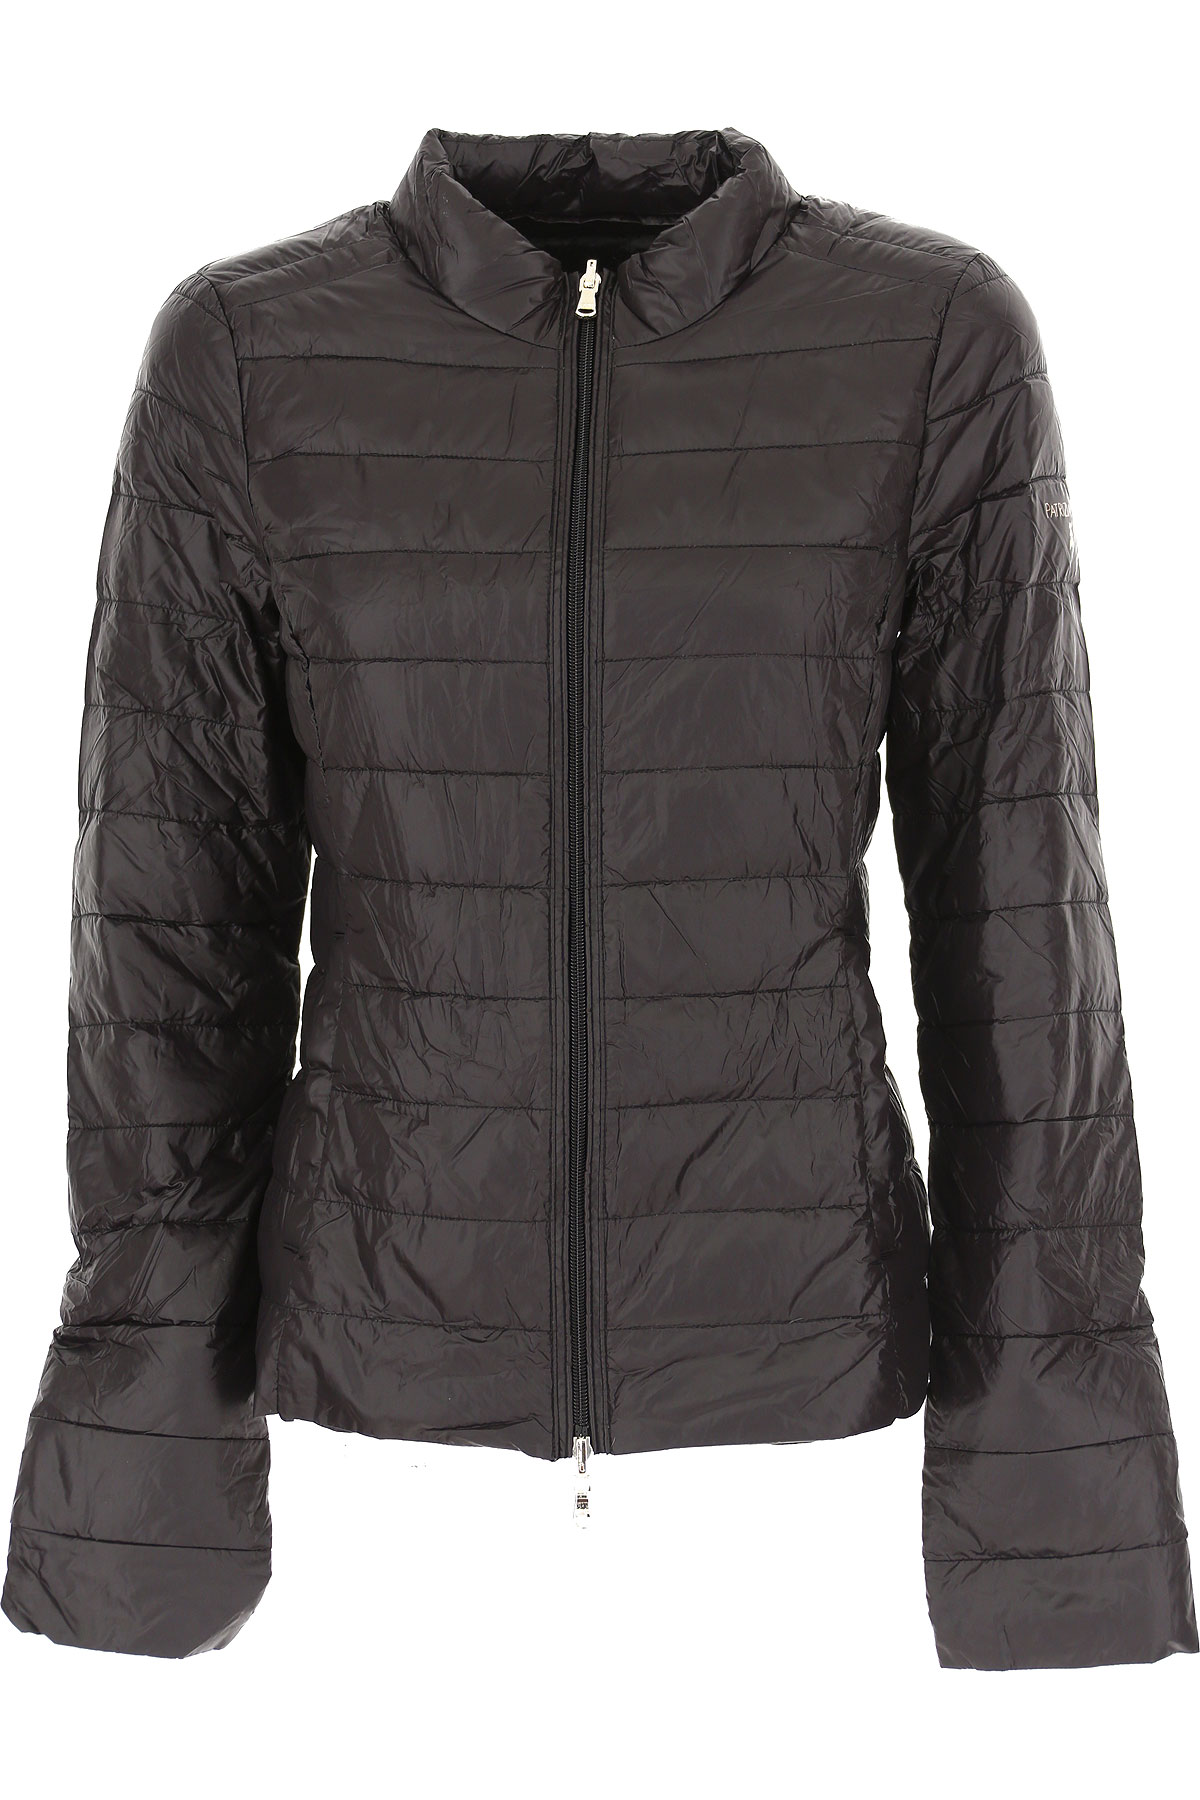 Patrizia Pepe Down Jacket for Women, Puffer Ski Jacket On Sale, Black, Down, 2019, 4 6 8